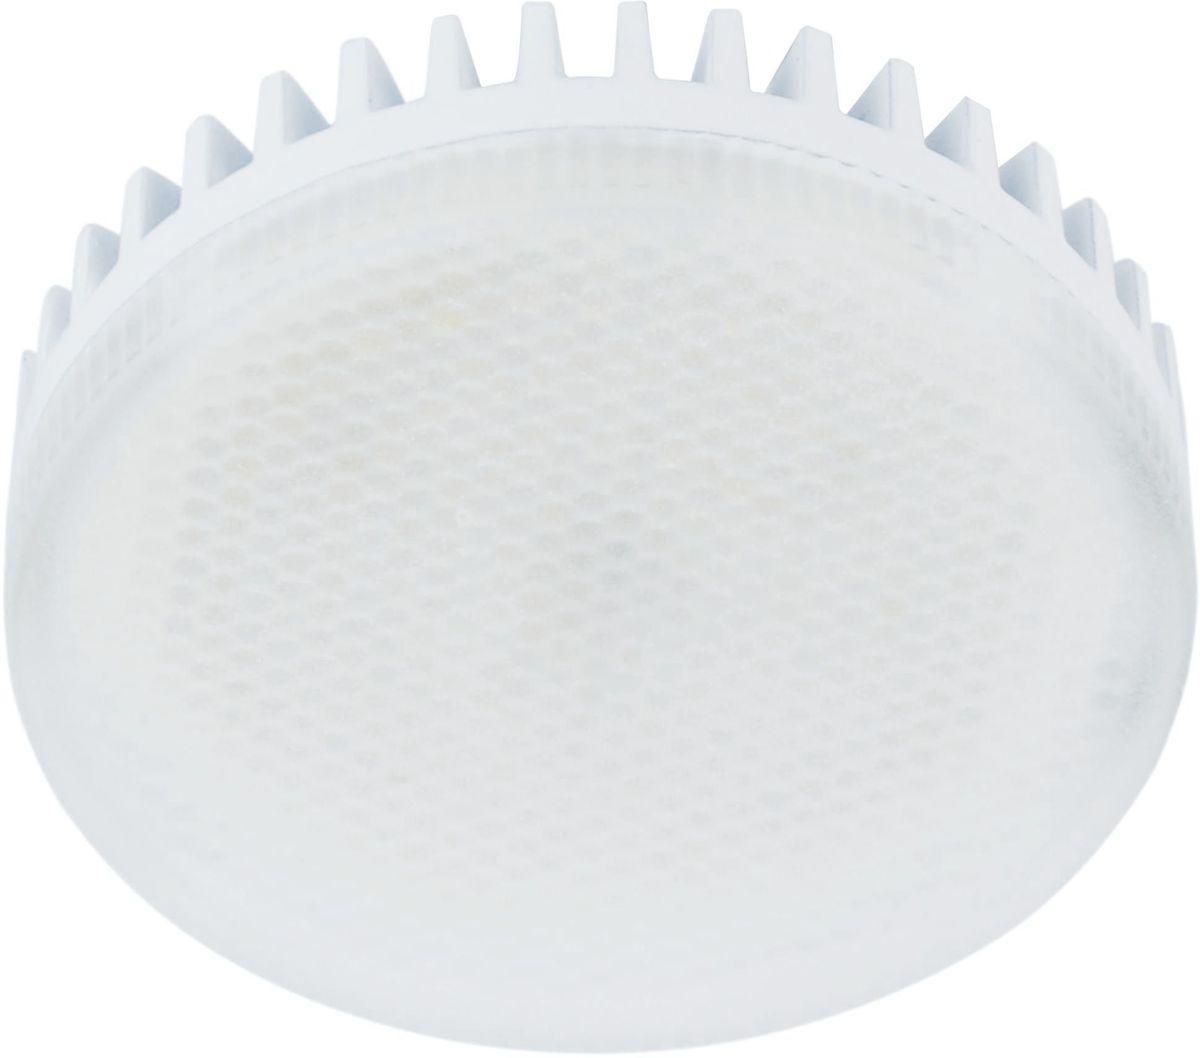 Лампа светодиодная REV, теплый свет, цоколь GX53, 10W. 32567 3 3 rev 30 women